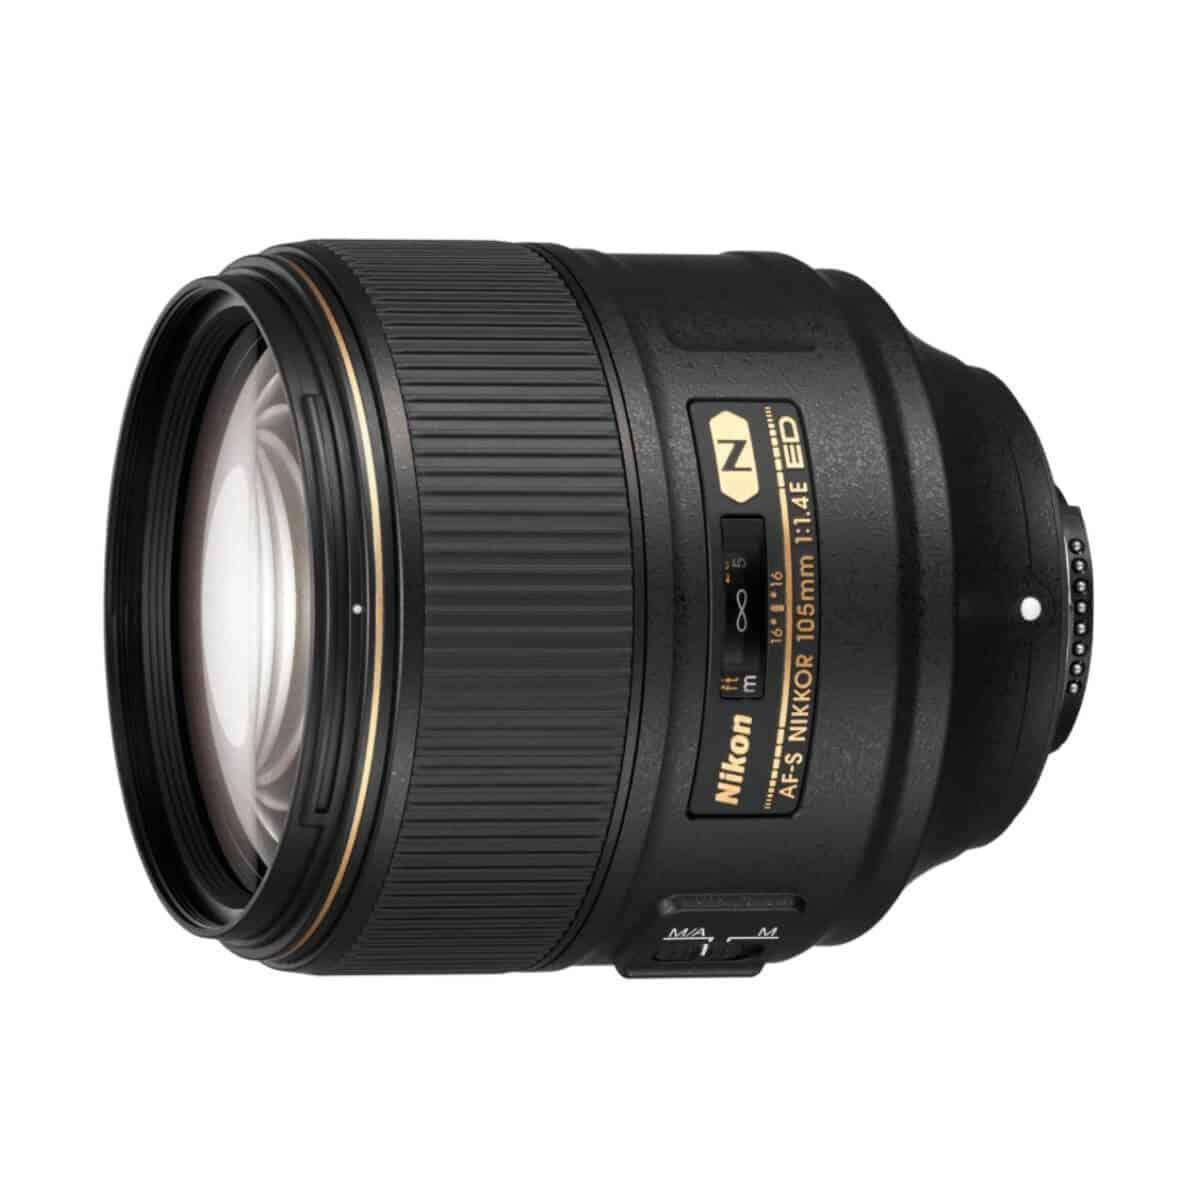 Nikon 105mm lens.